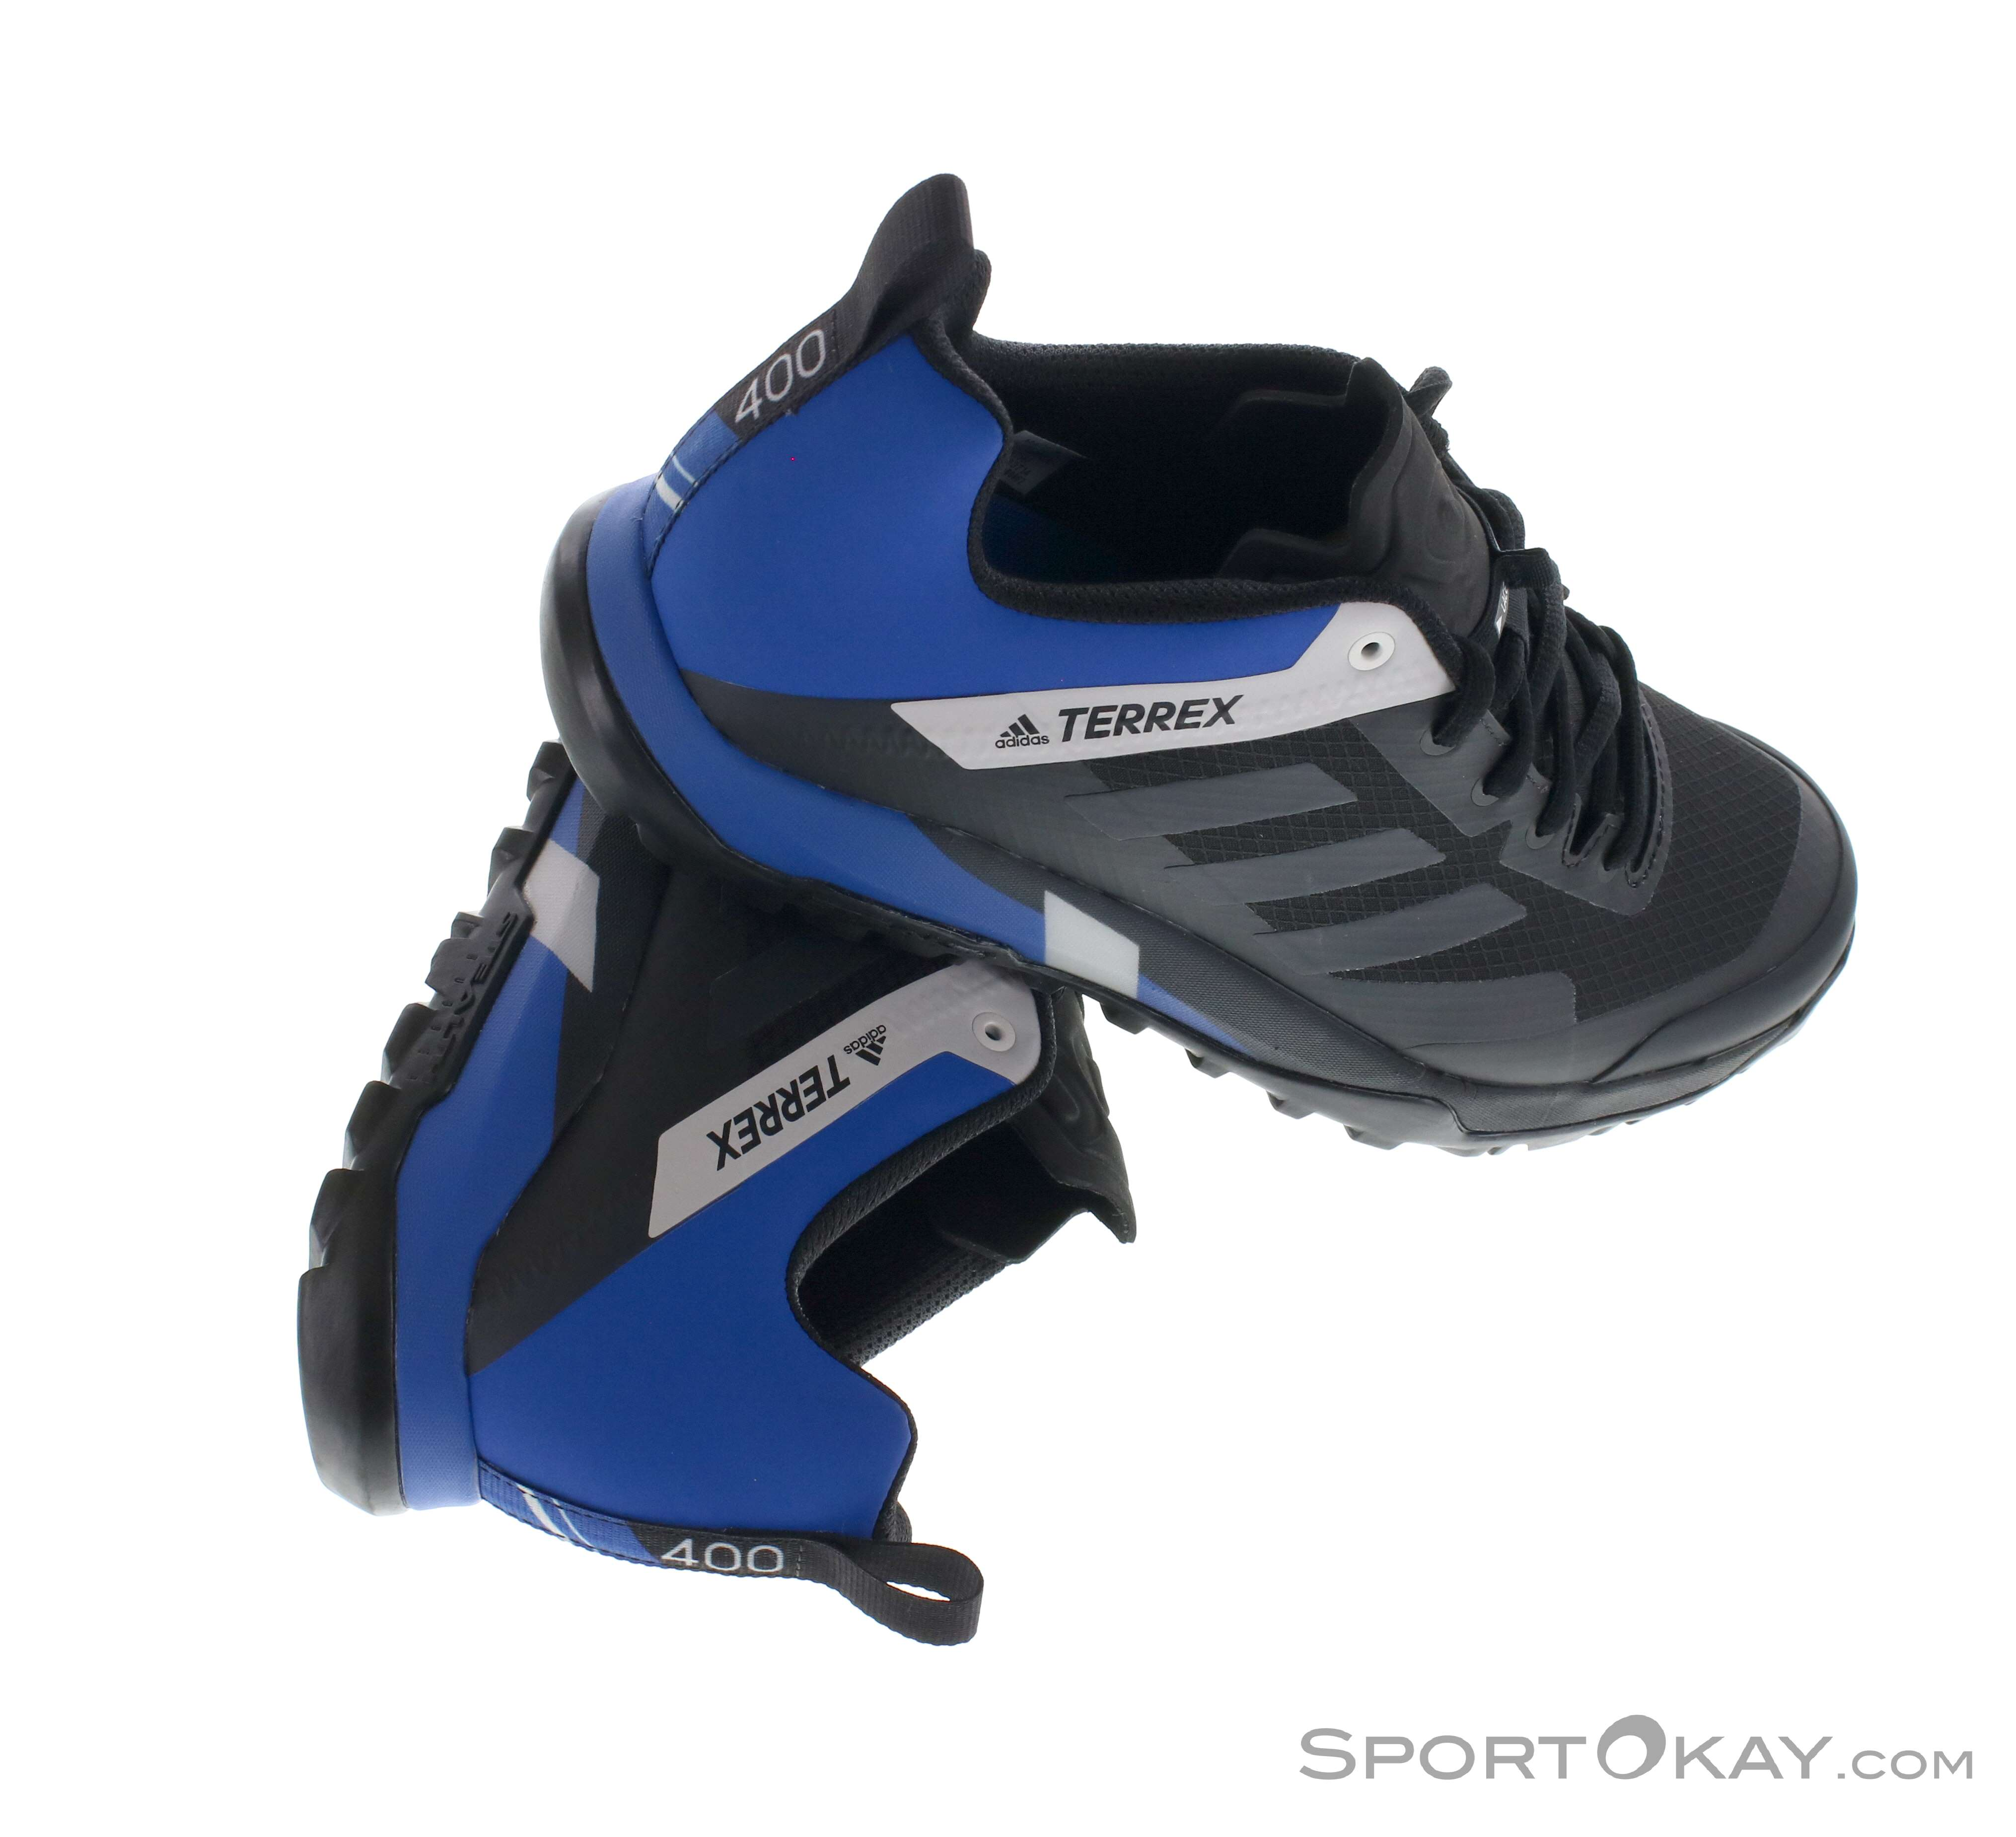 adidas Terrex Trail Cross SL Uomo Scarpe da Bici Scarpe